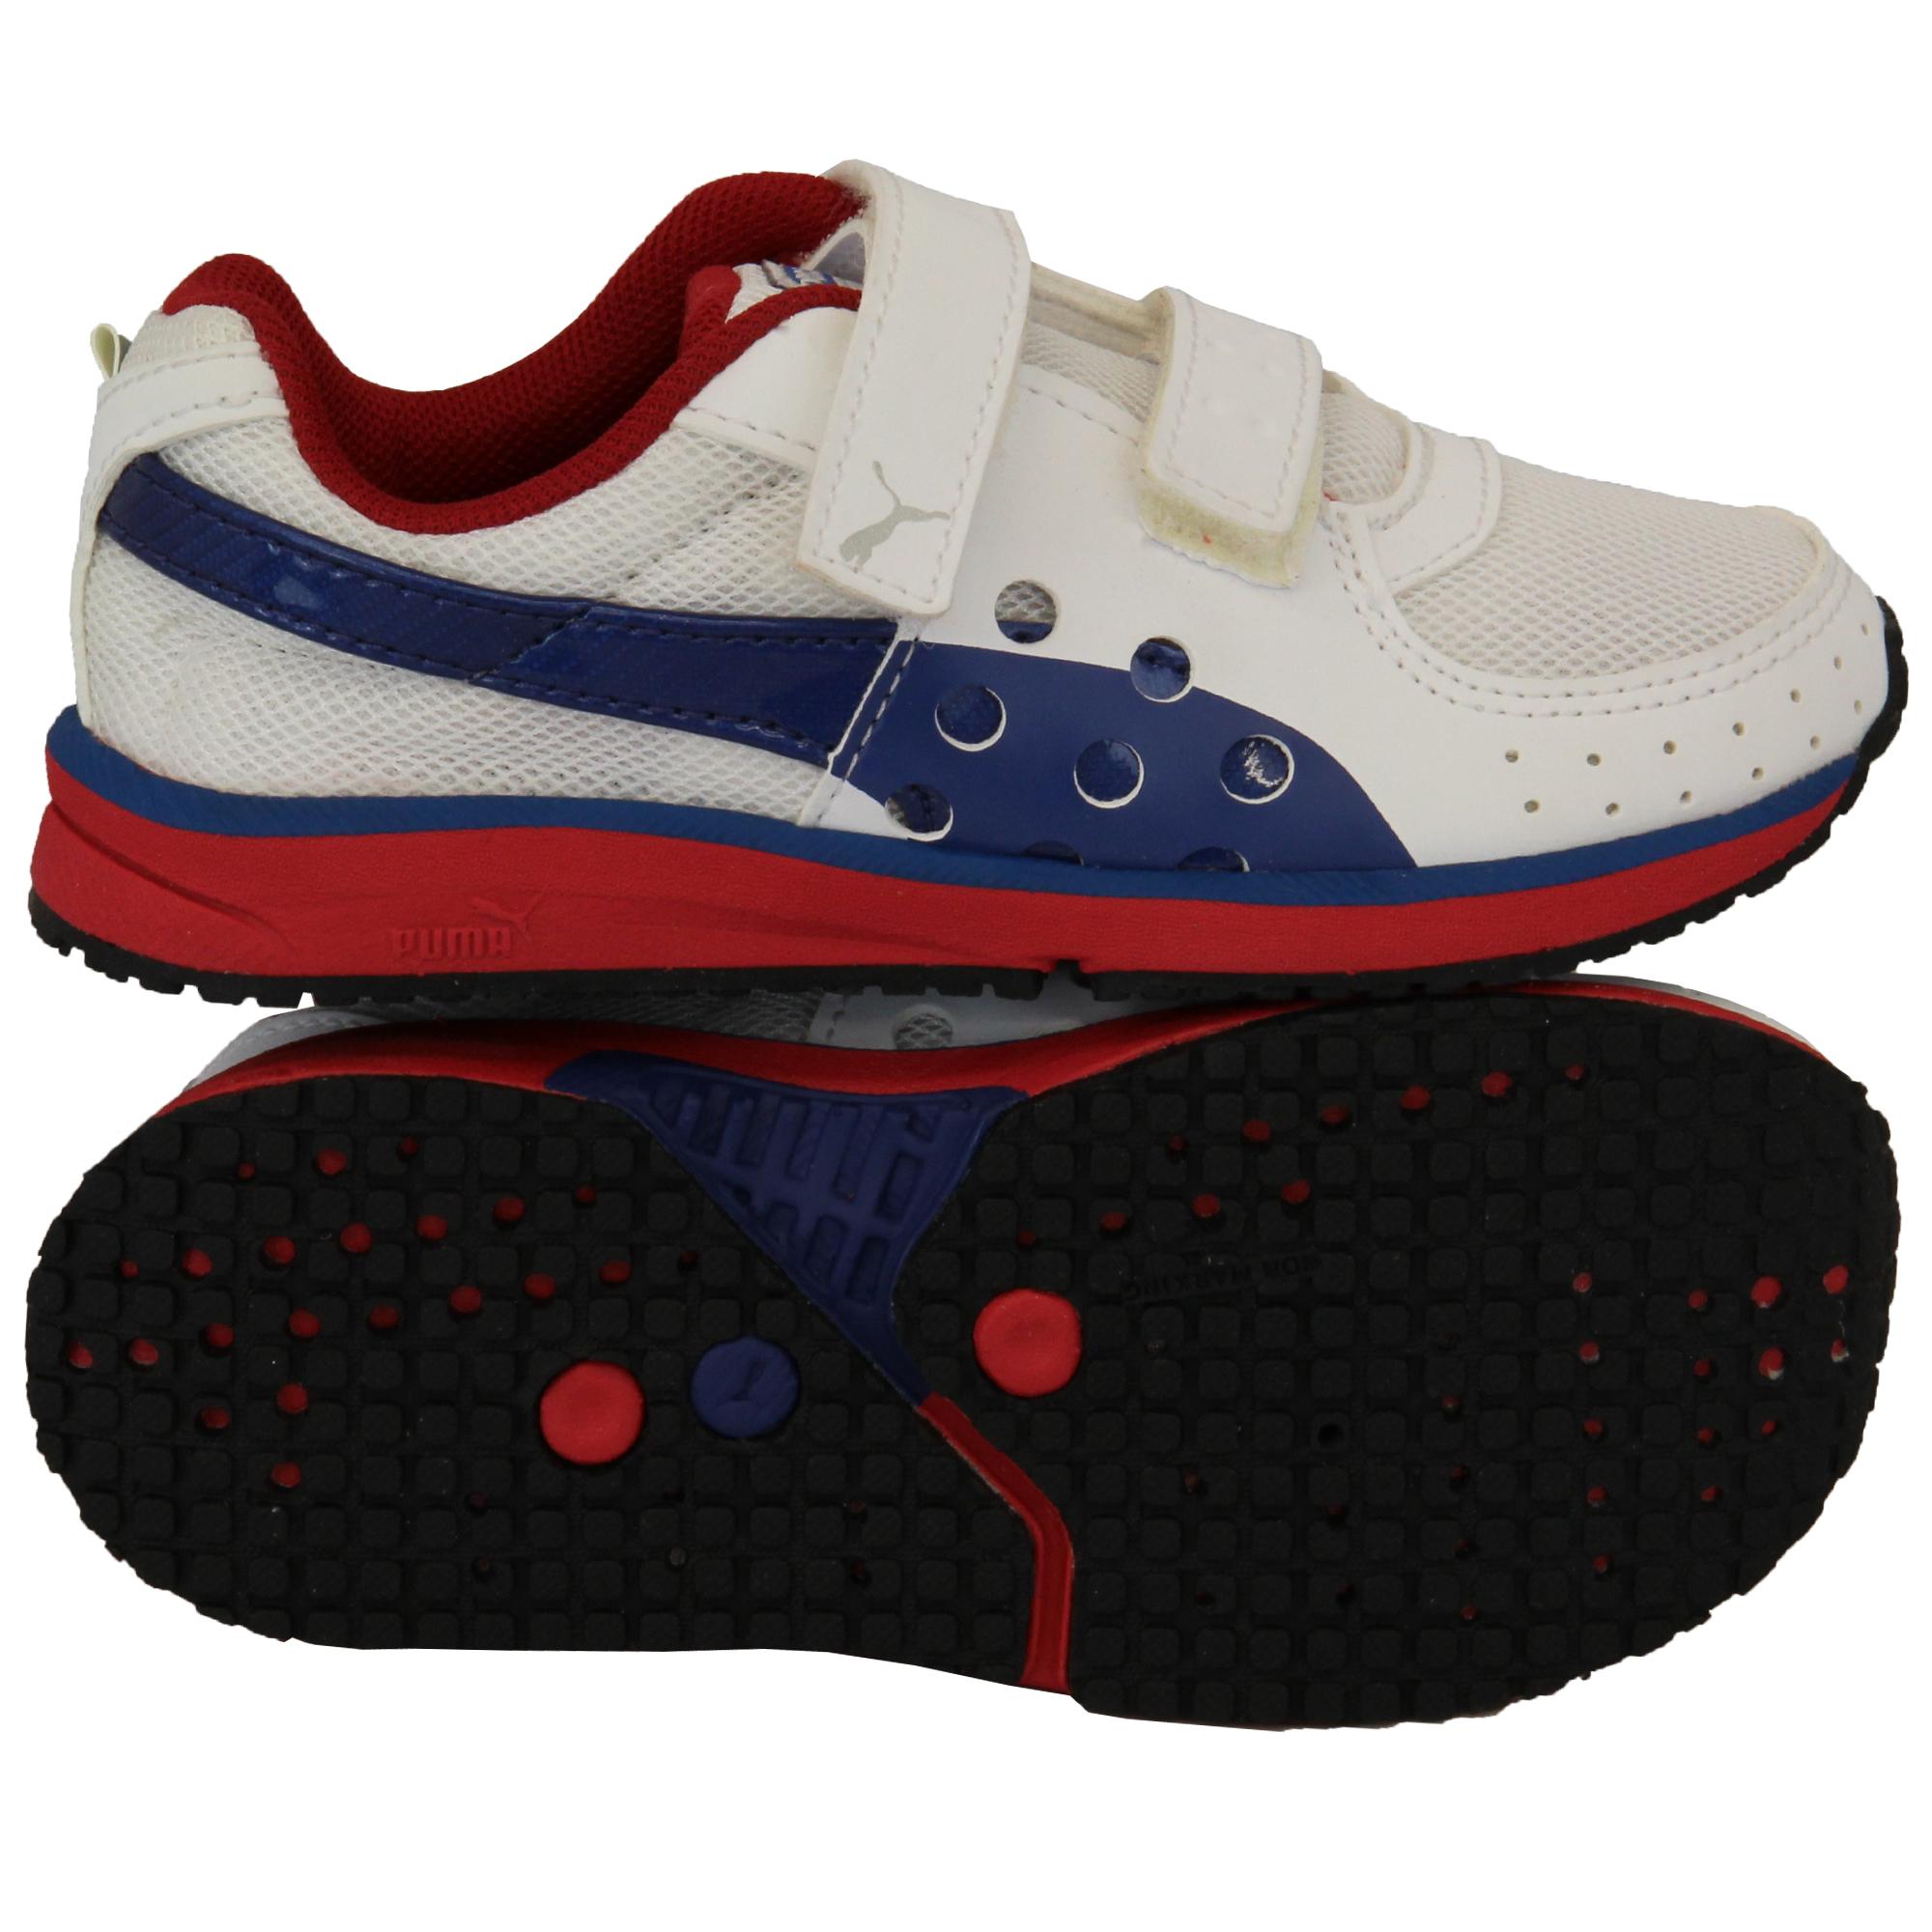 Boys PUMA Trainers Kids Suede Leather Shoes Infants ...